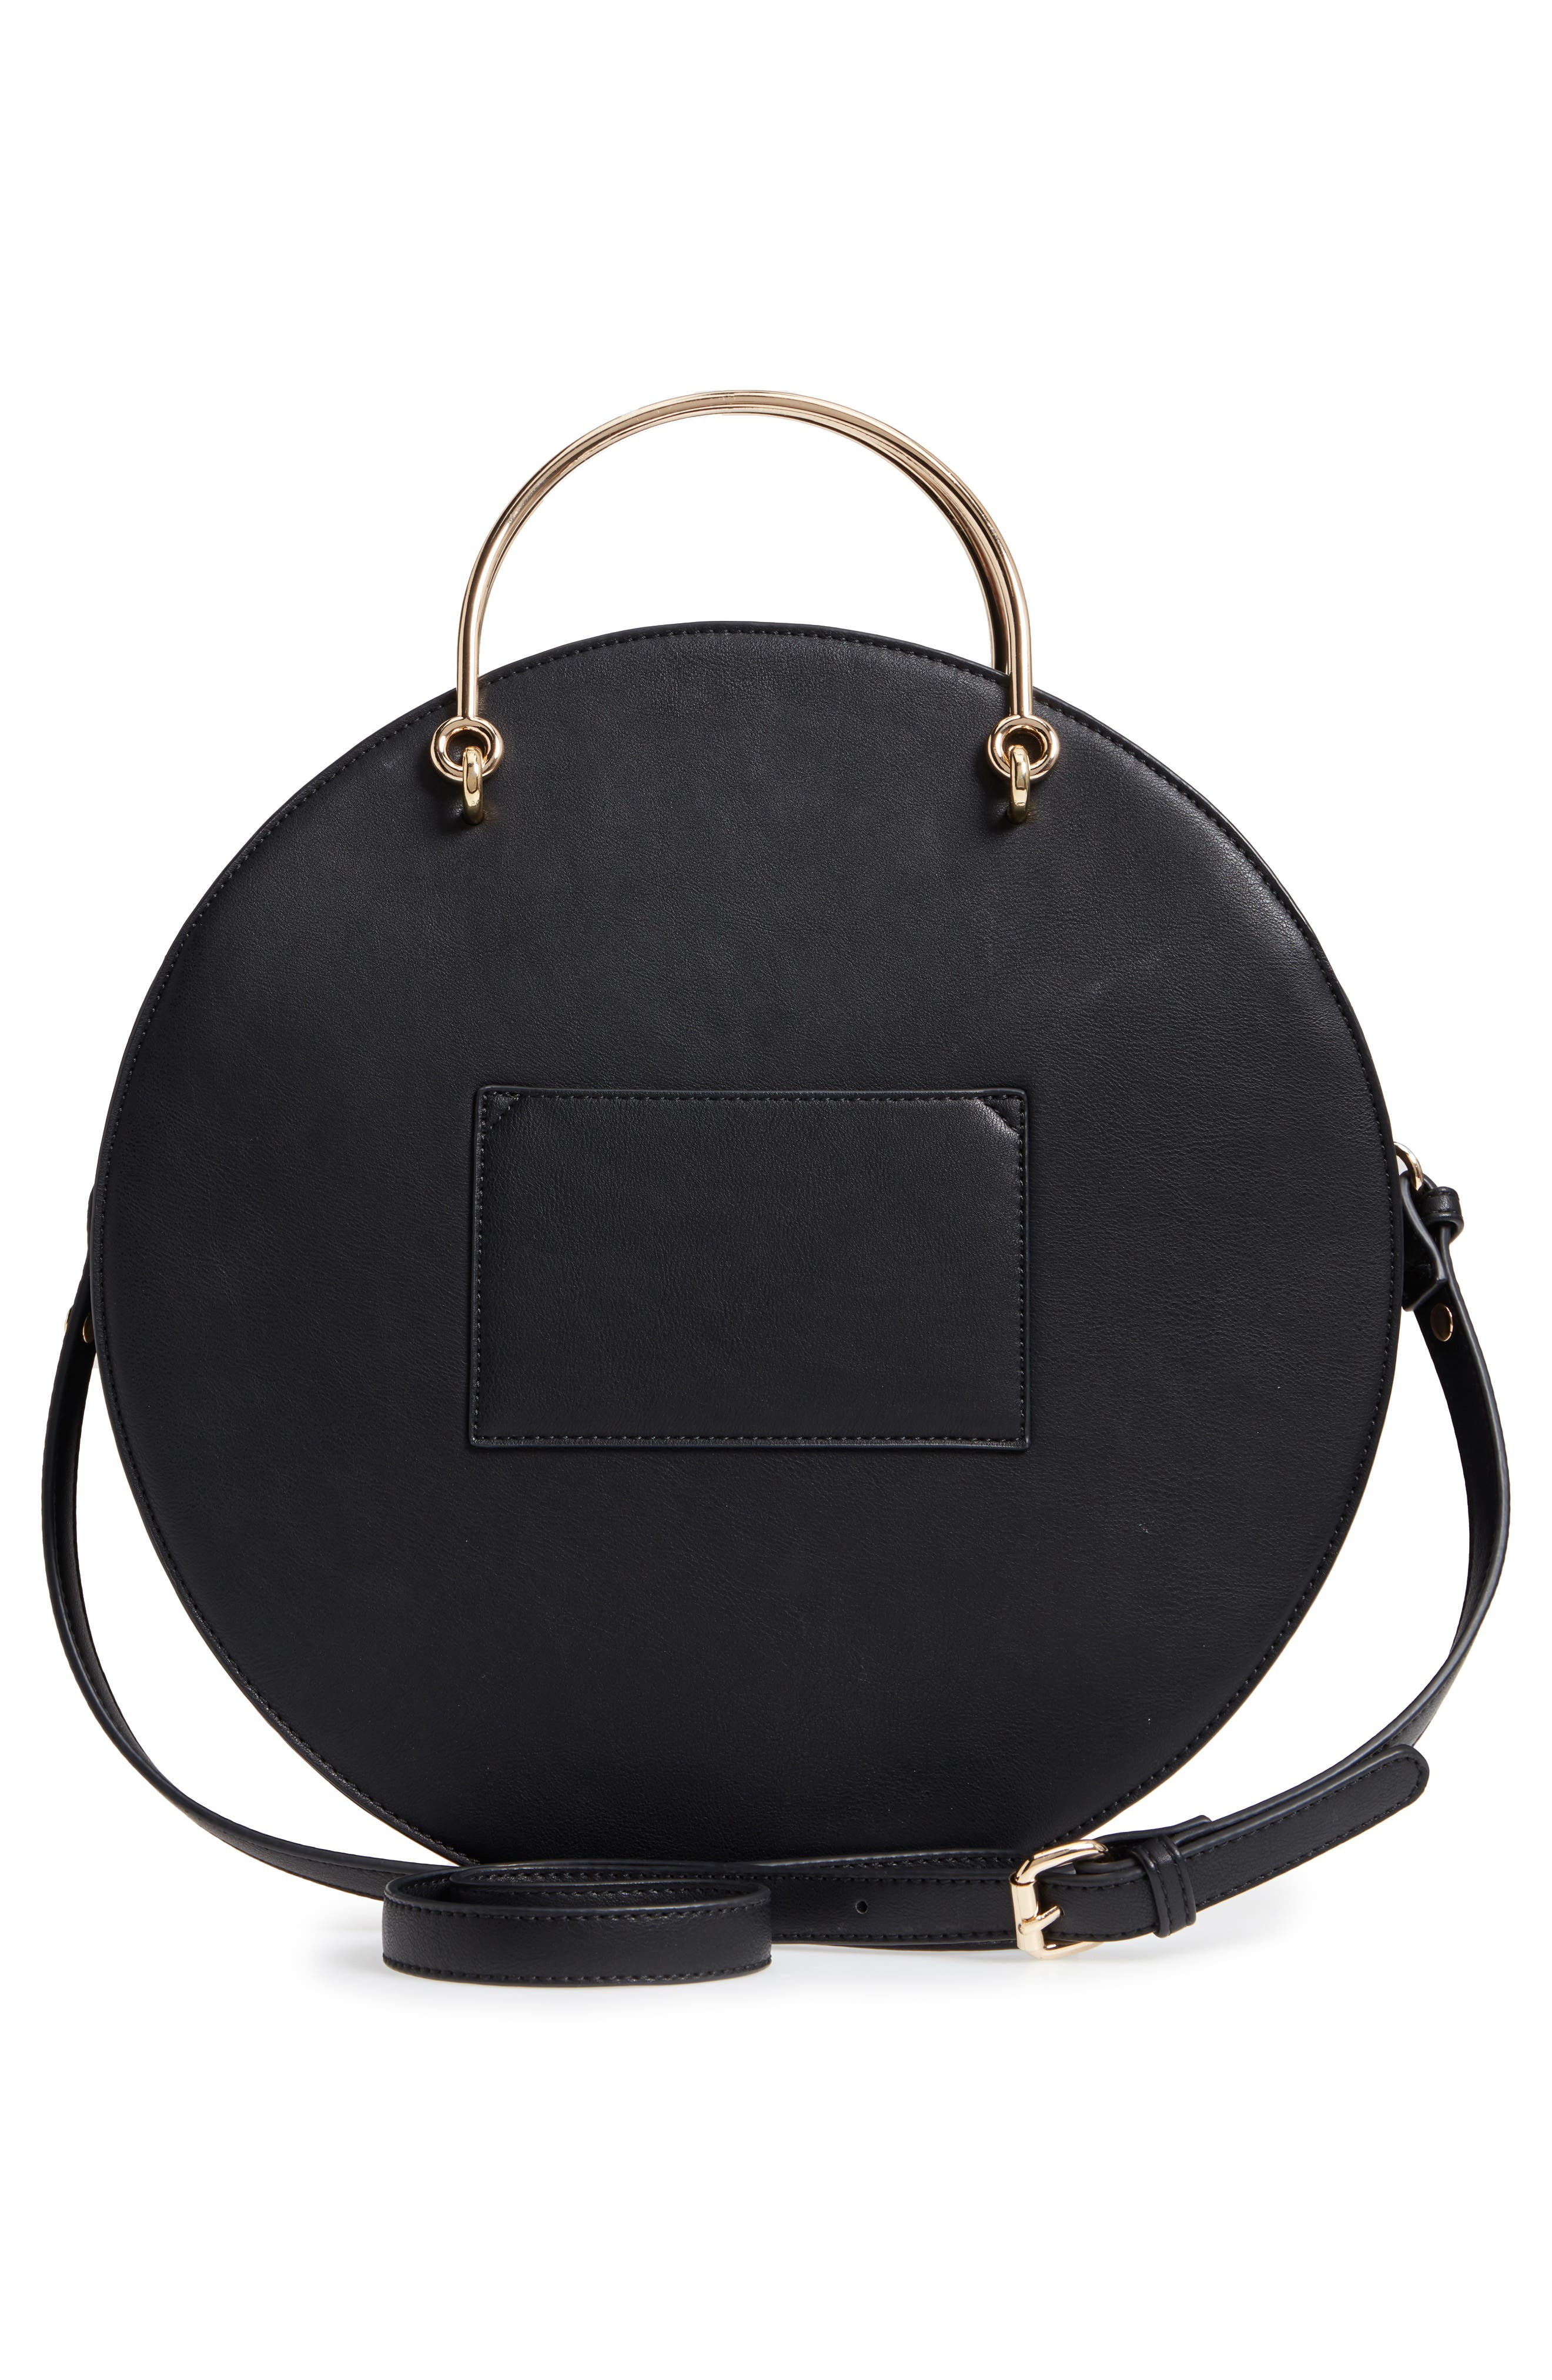 Mali + Lili Vegan Leather Round Top Handle Bag,                             Alternate thumbnail 3, color,                             001